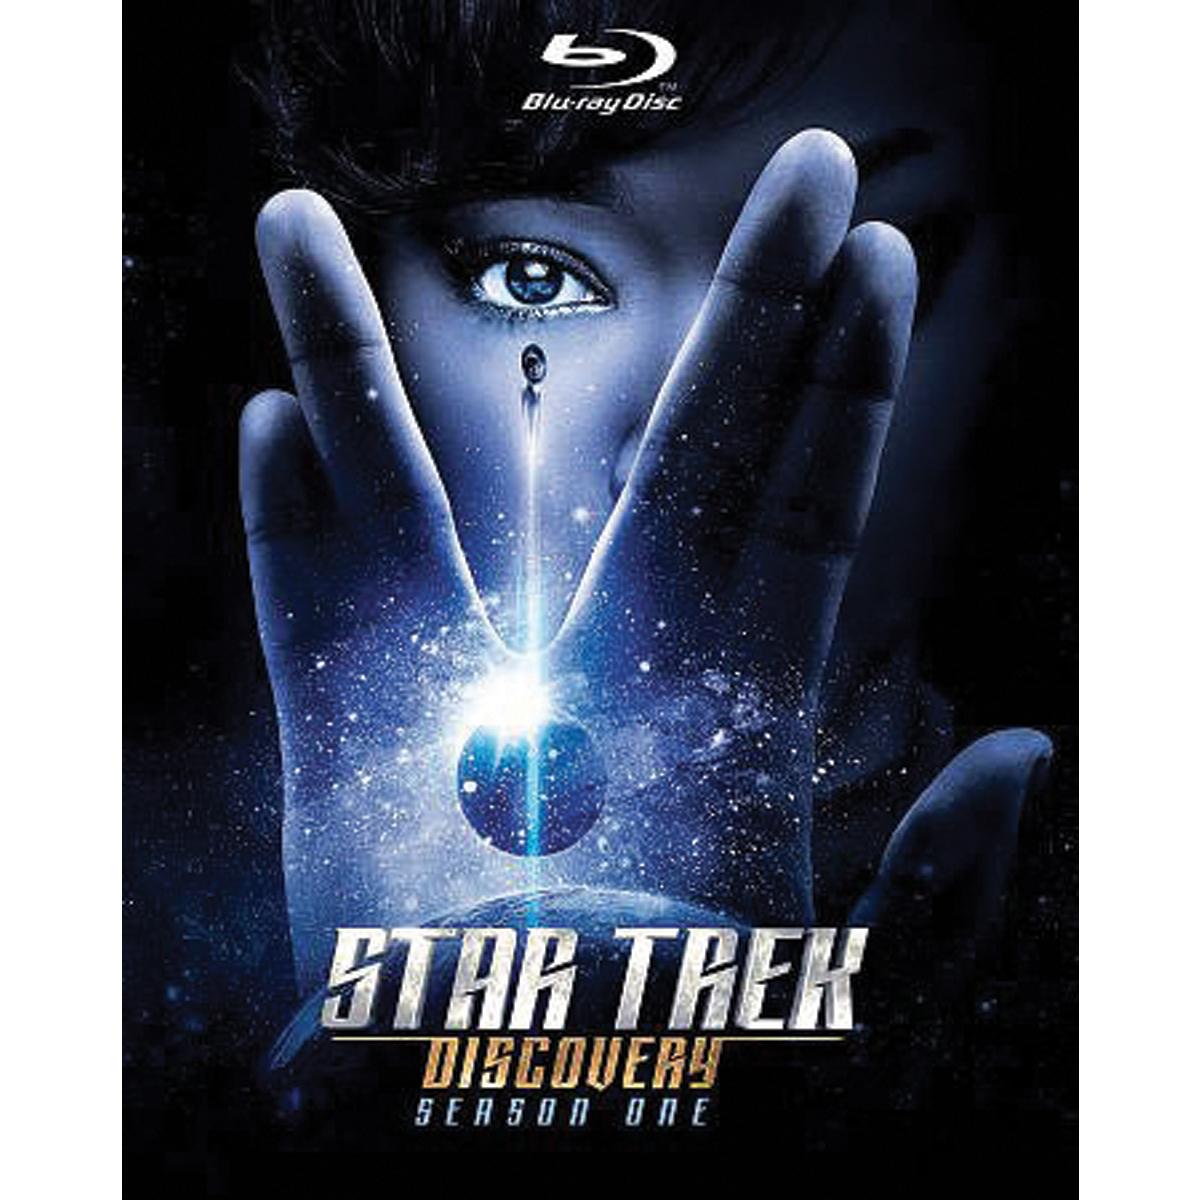 Star Trek: Discovery Season 1 Blu-ray